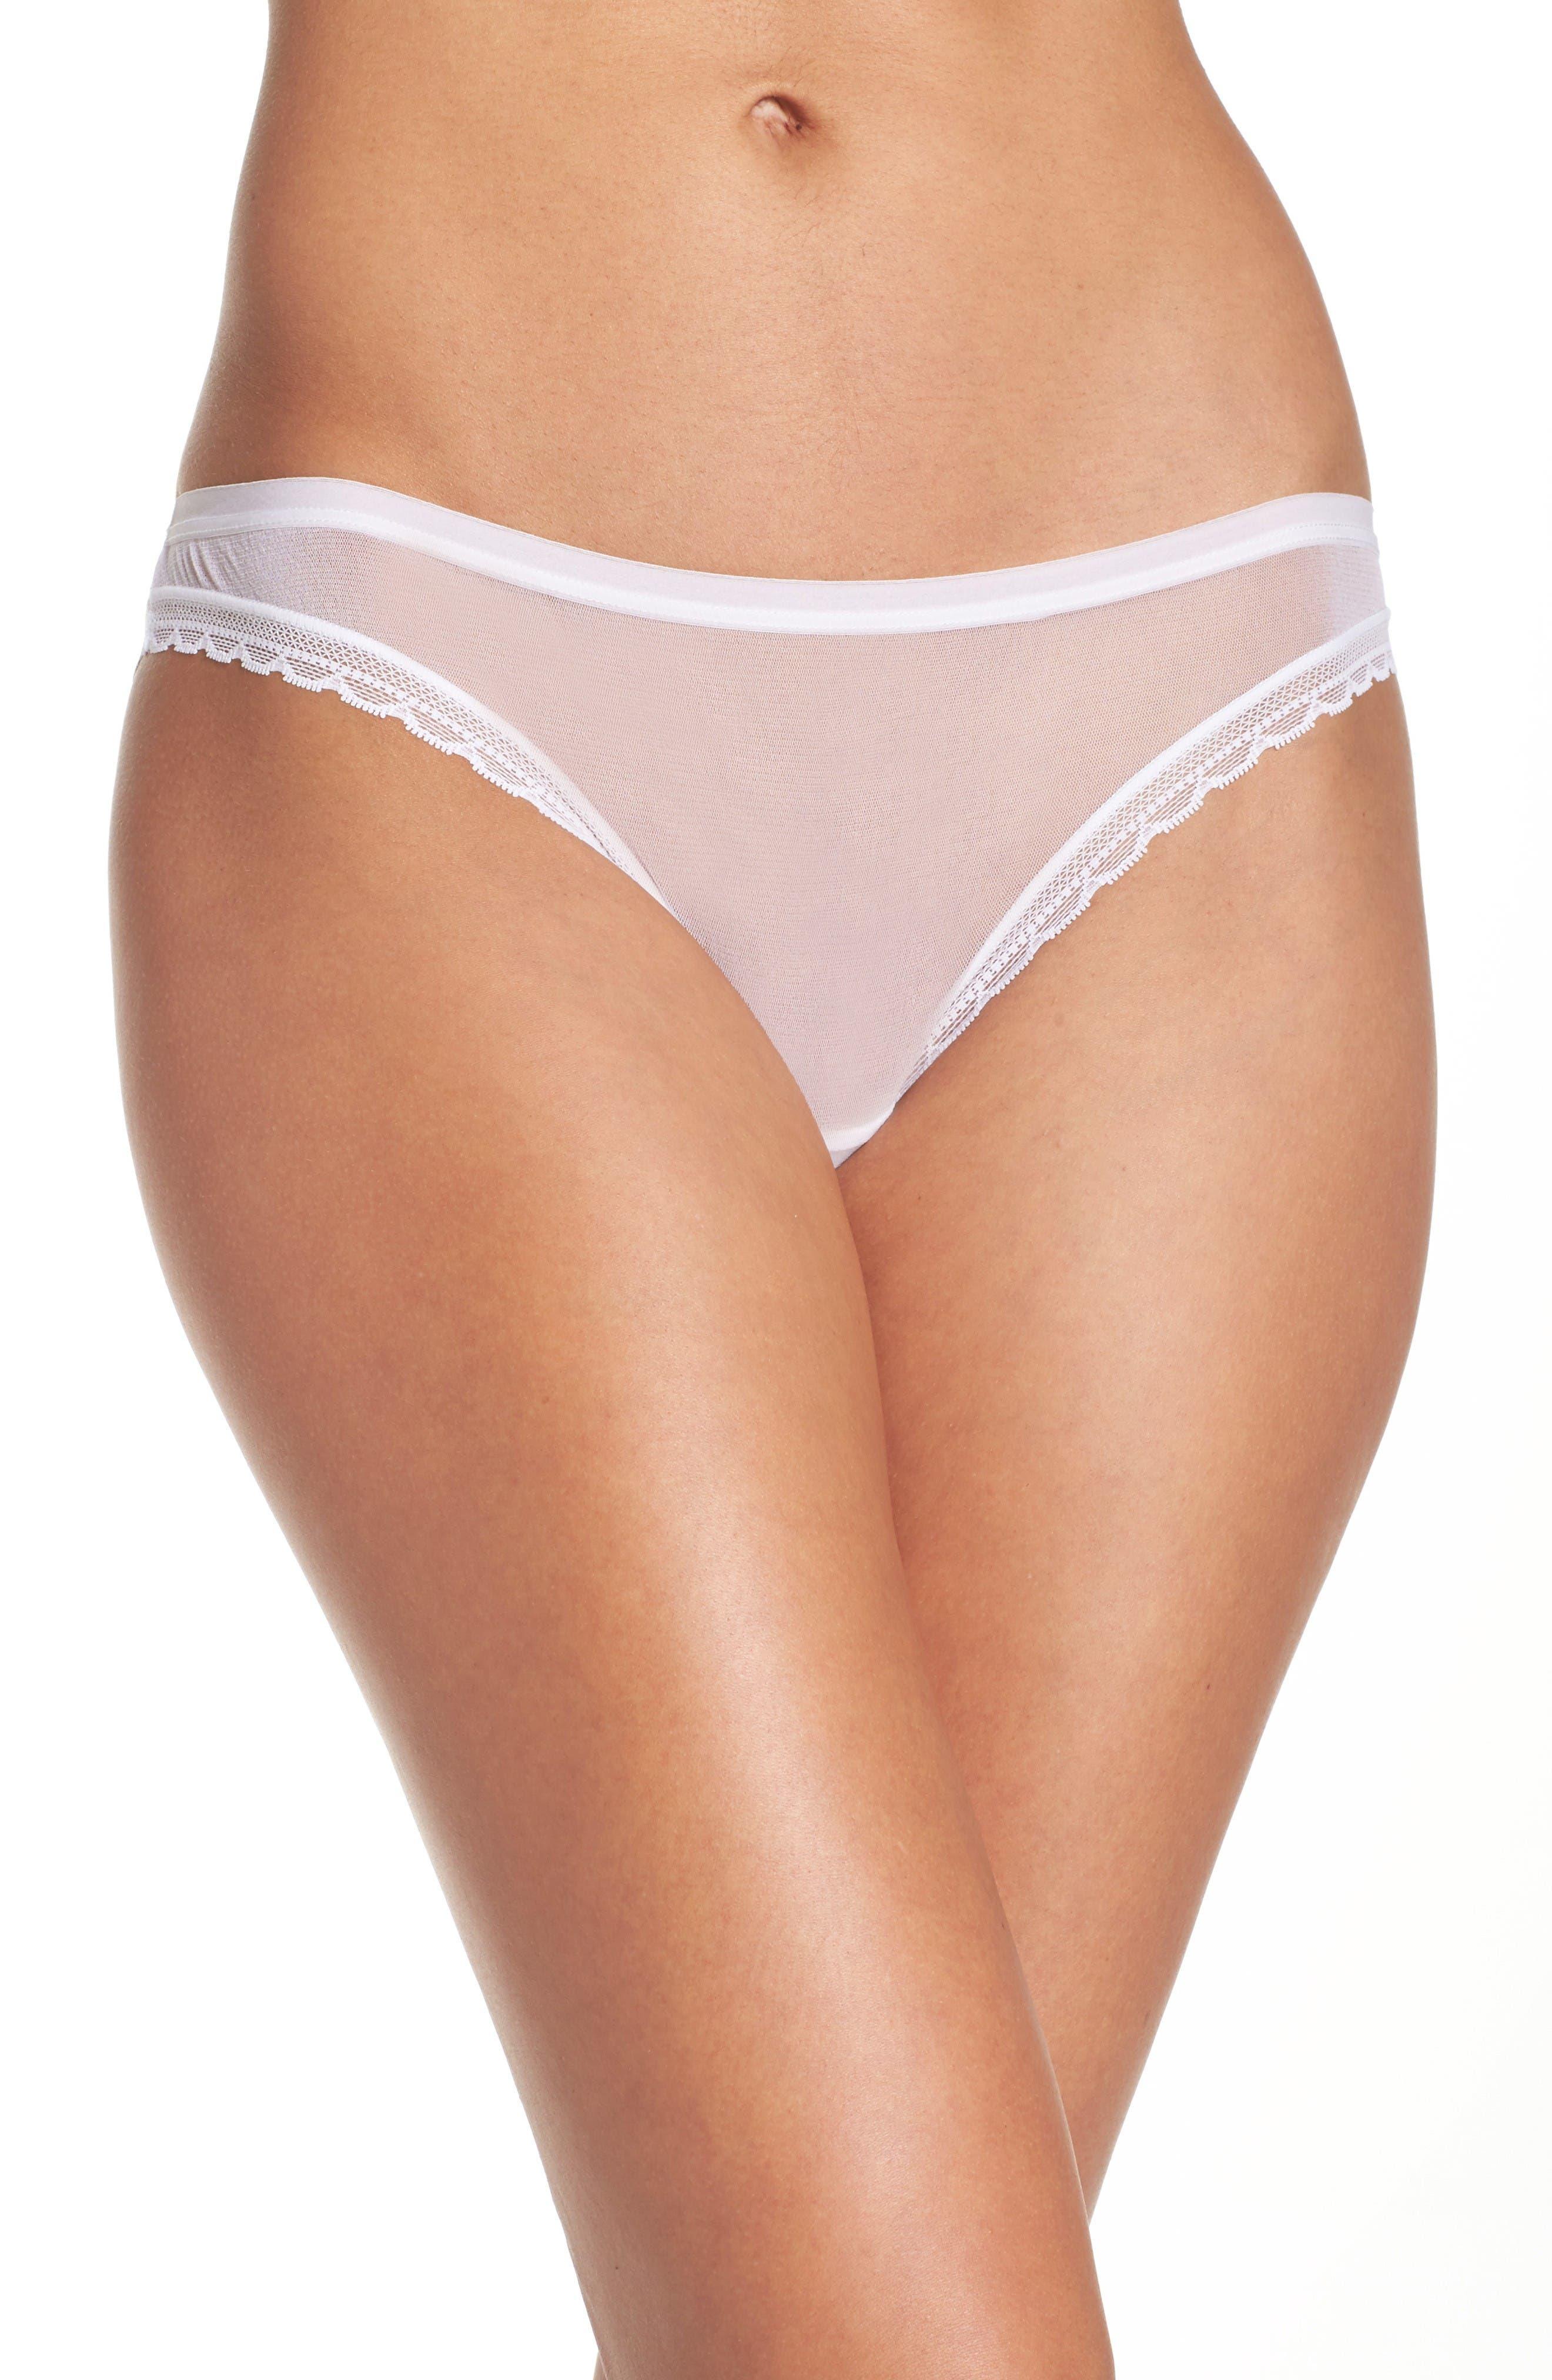 Mesh Bikini,                         Main,                         color, White